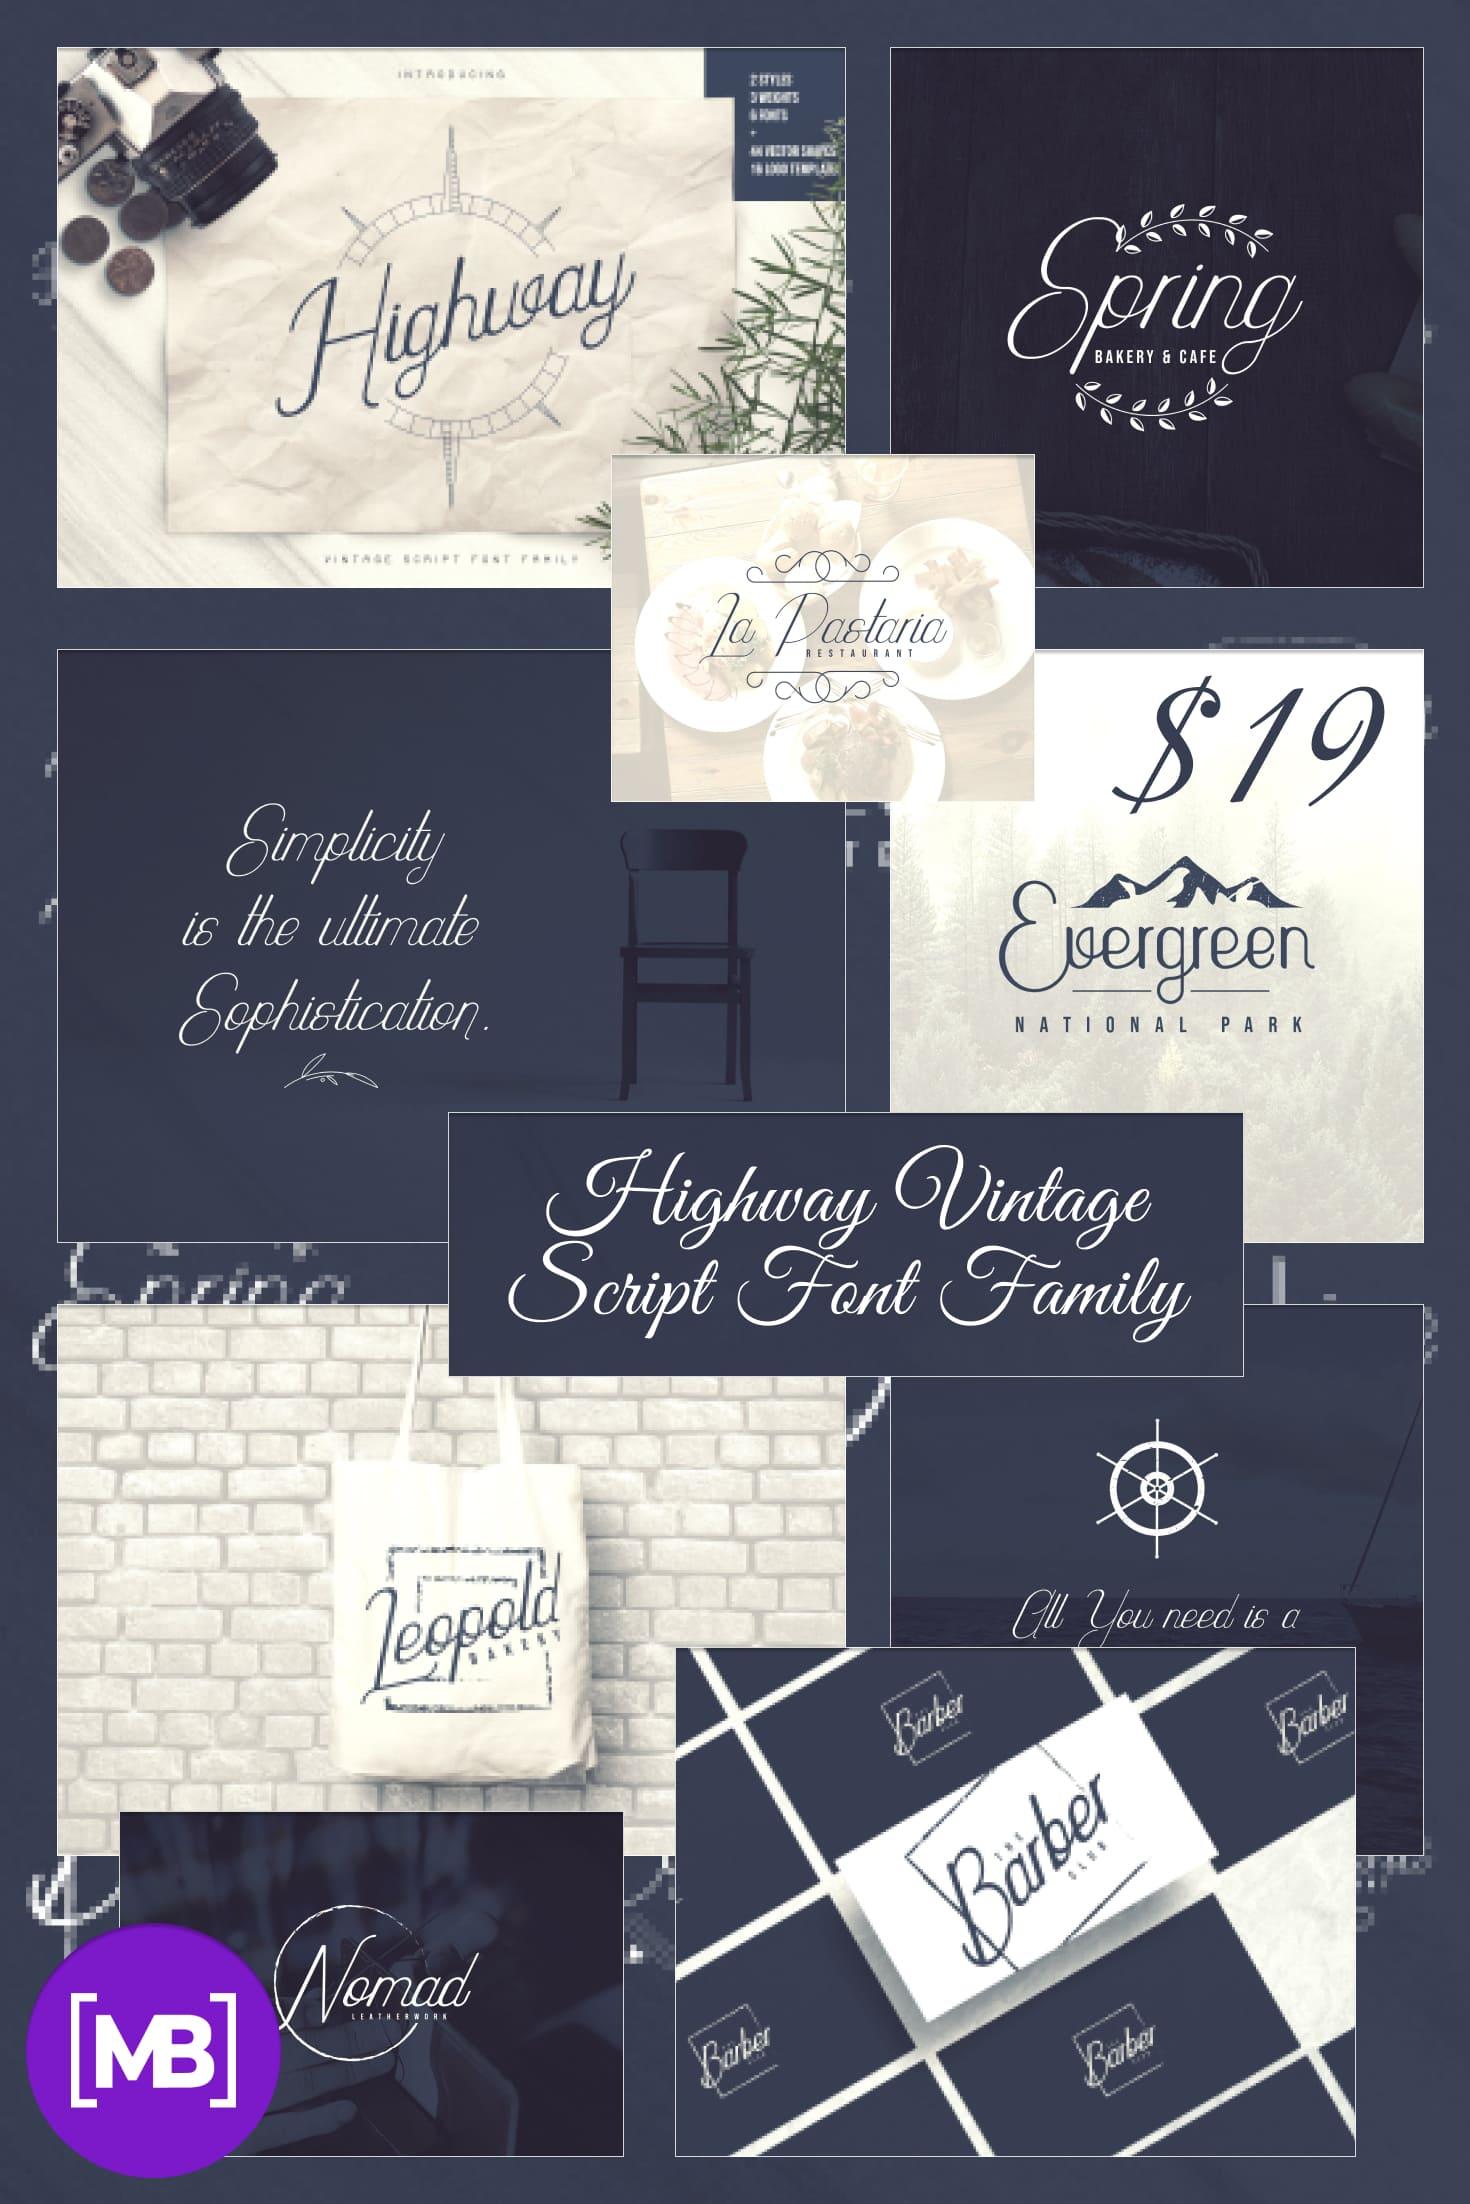 Pinterest Image: Highway Vintage Script Font Family + Extras - $19.